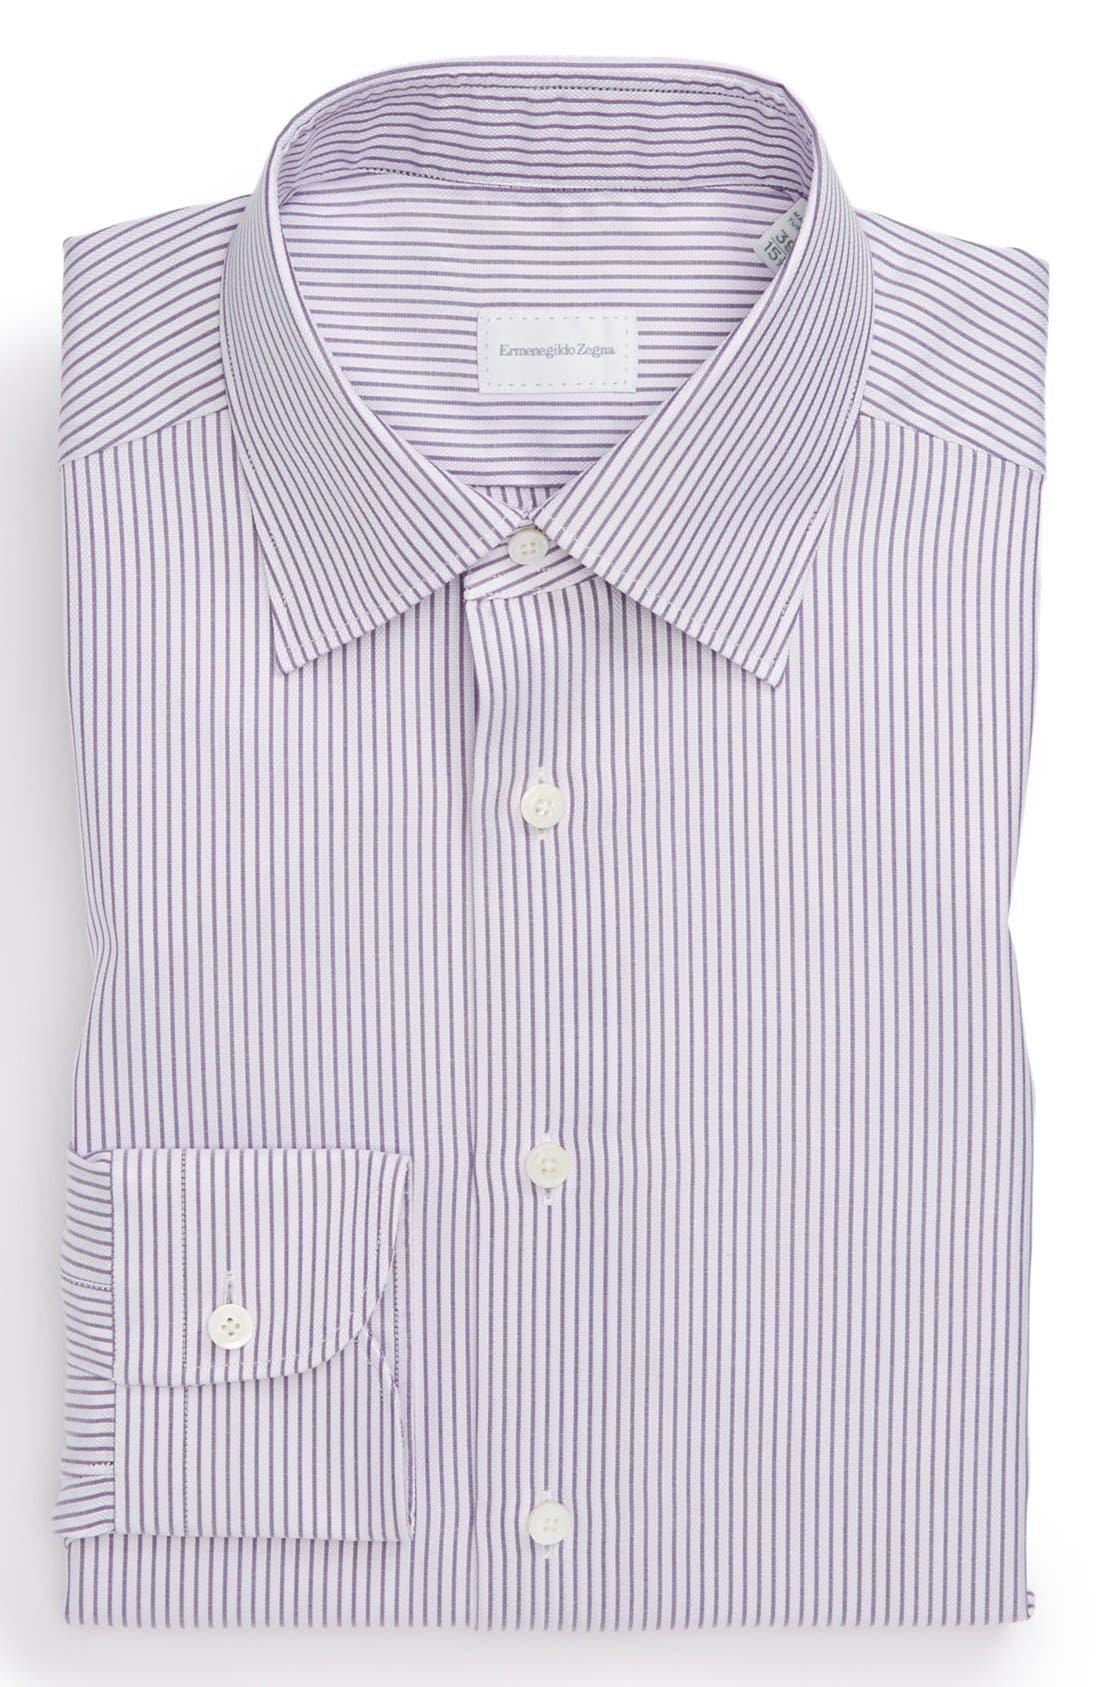 Classic Fit Dress Shirt,                             Main thumbnail 1, color,                             504